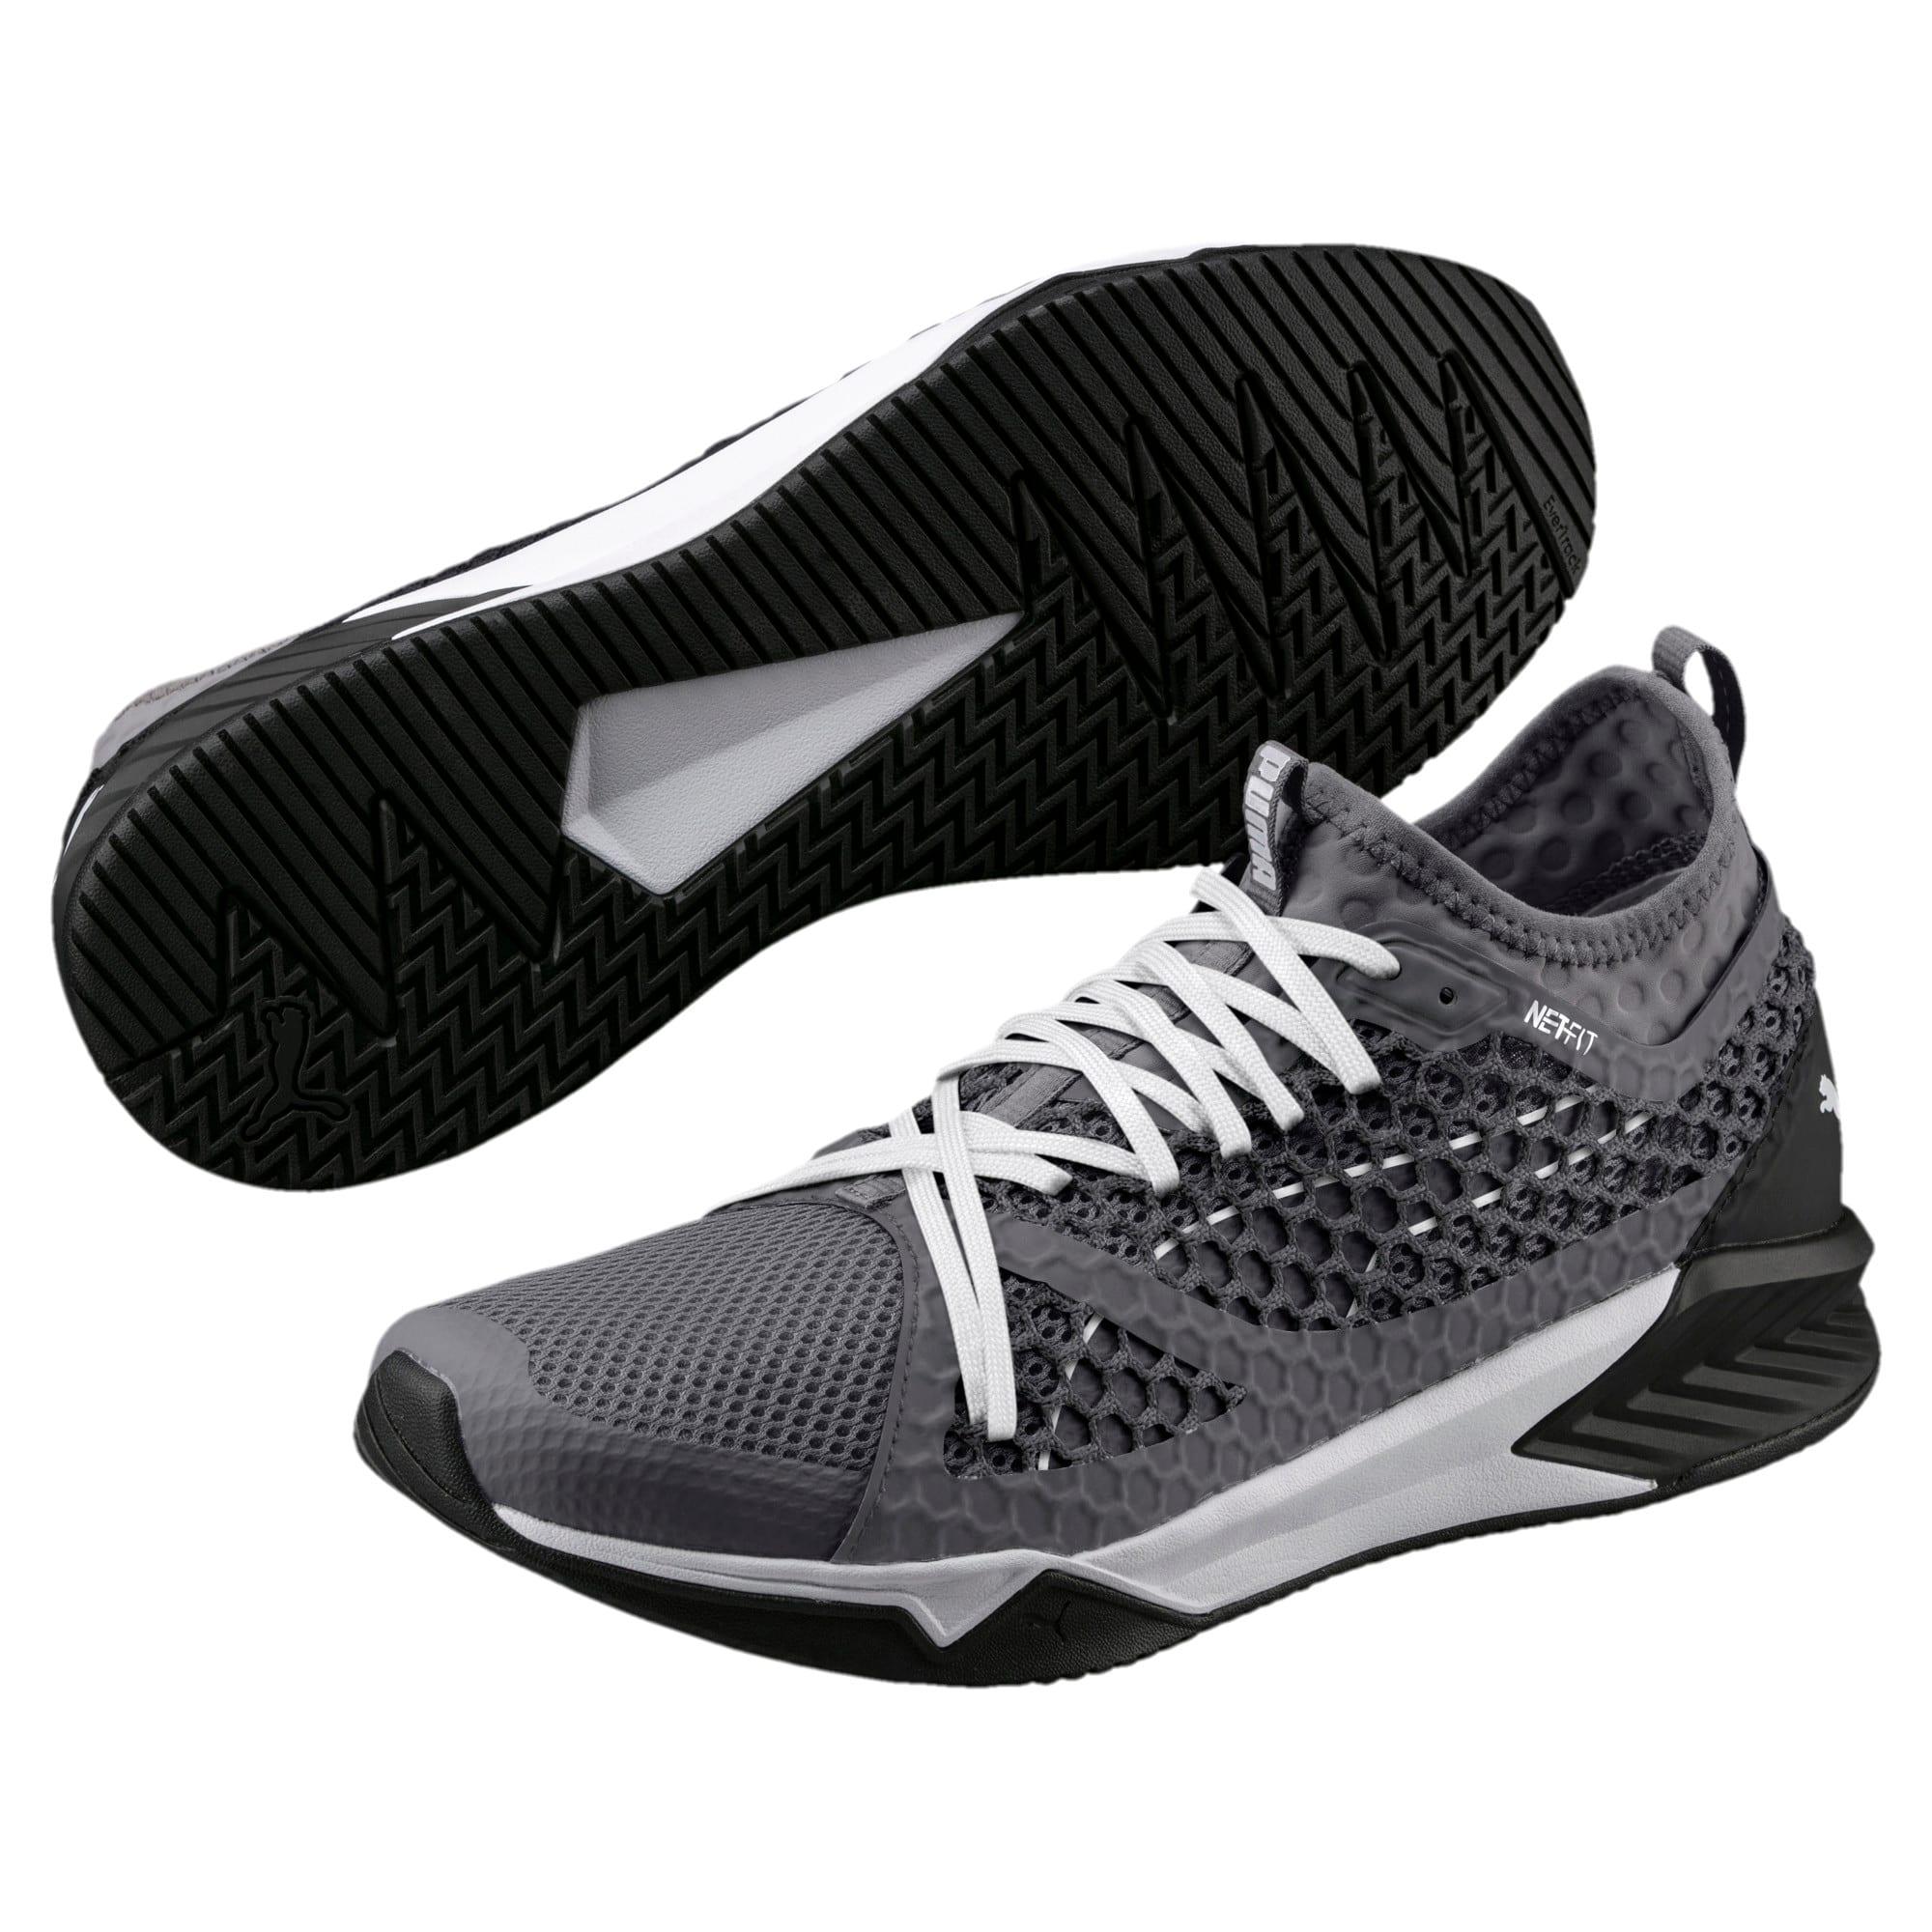 Thumbnail 2 of IGNITE XT NETFIT Men's Training Shoes, QUIET SHADE-Puma Black, medium-IND